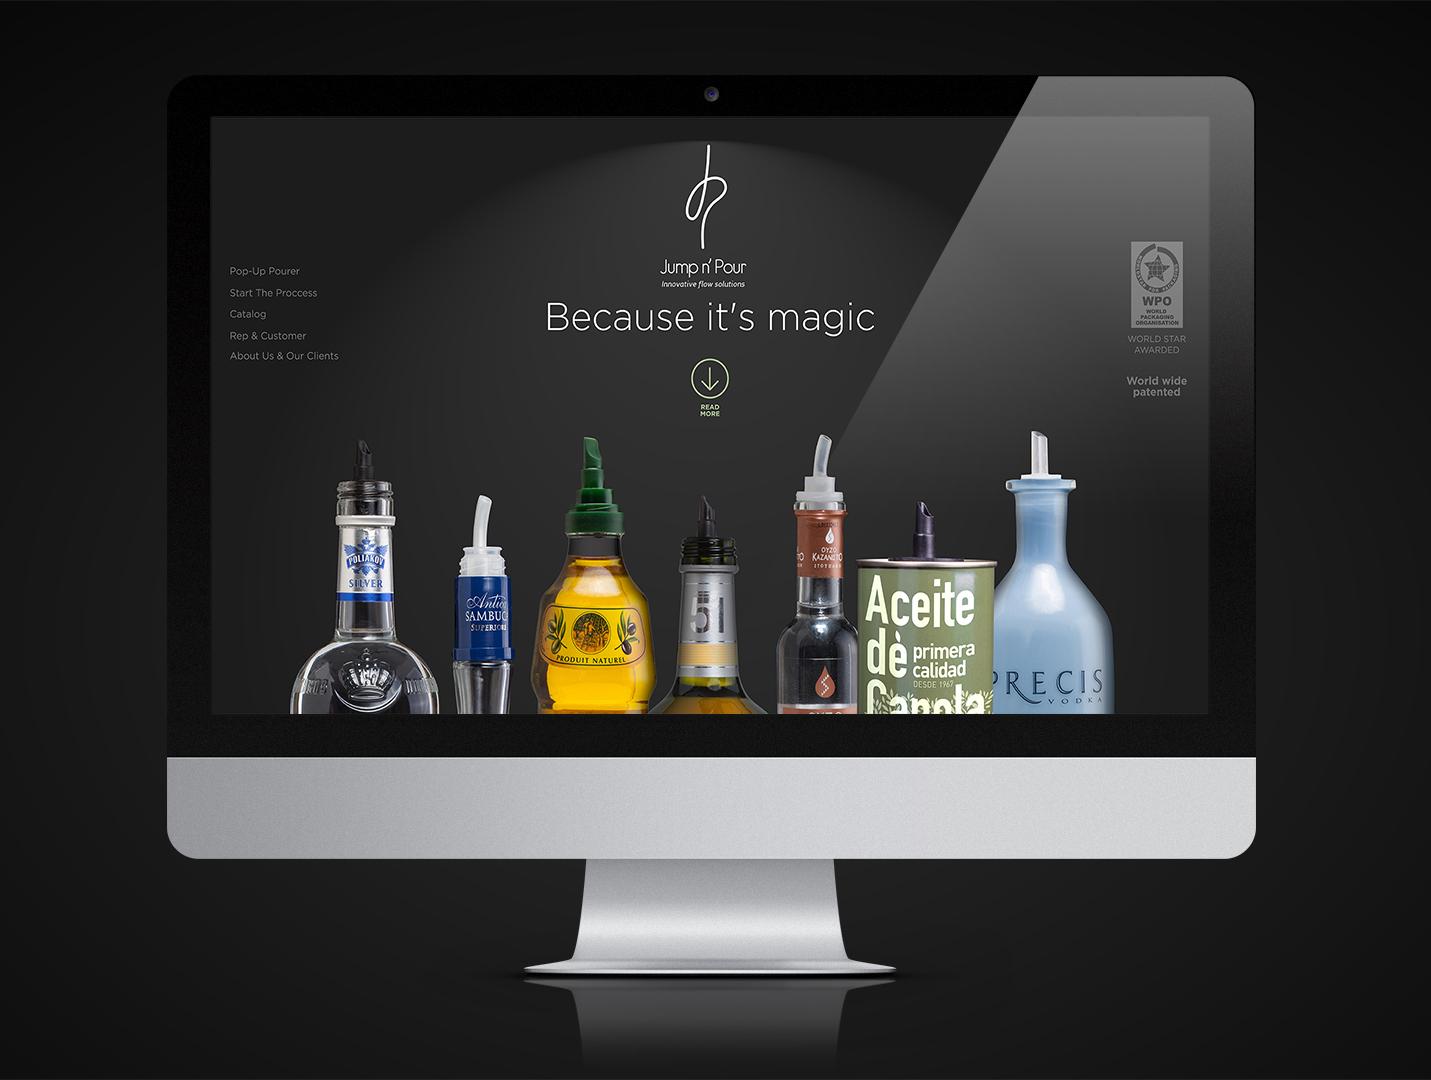 iMac-black